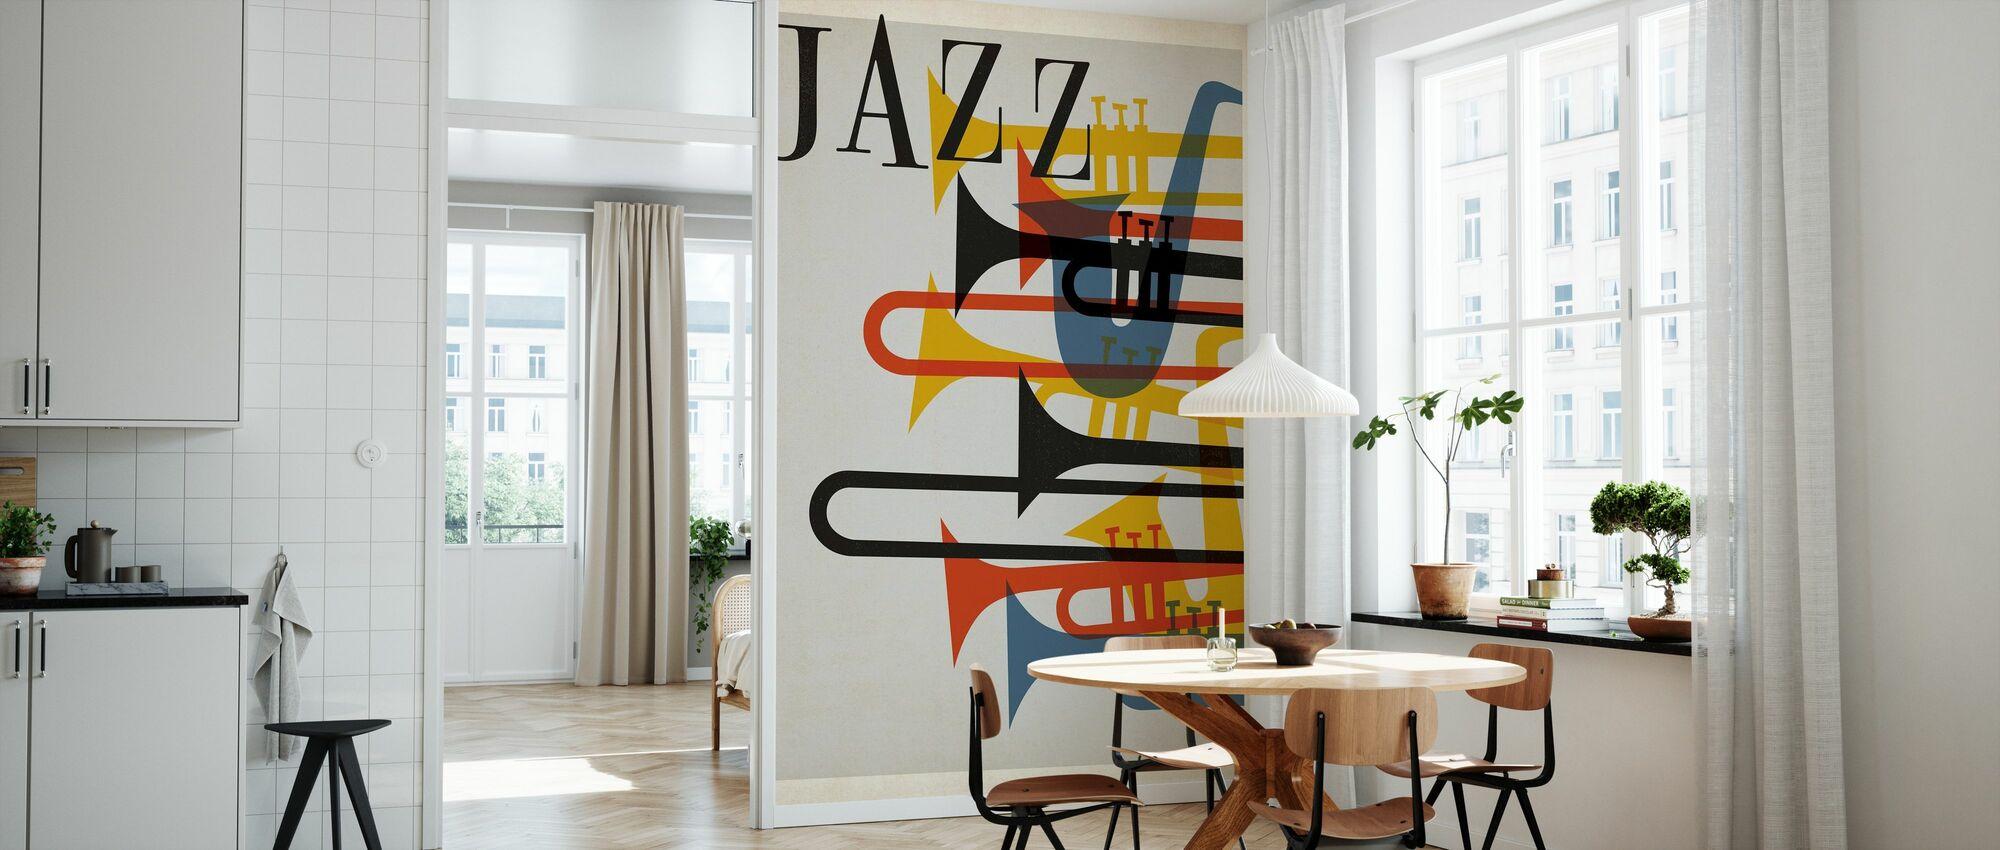 Jazzen - Tapet - Køkken